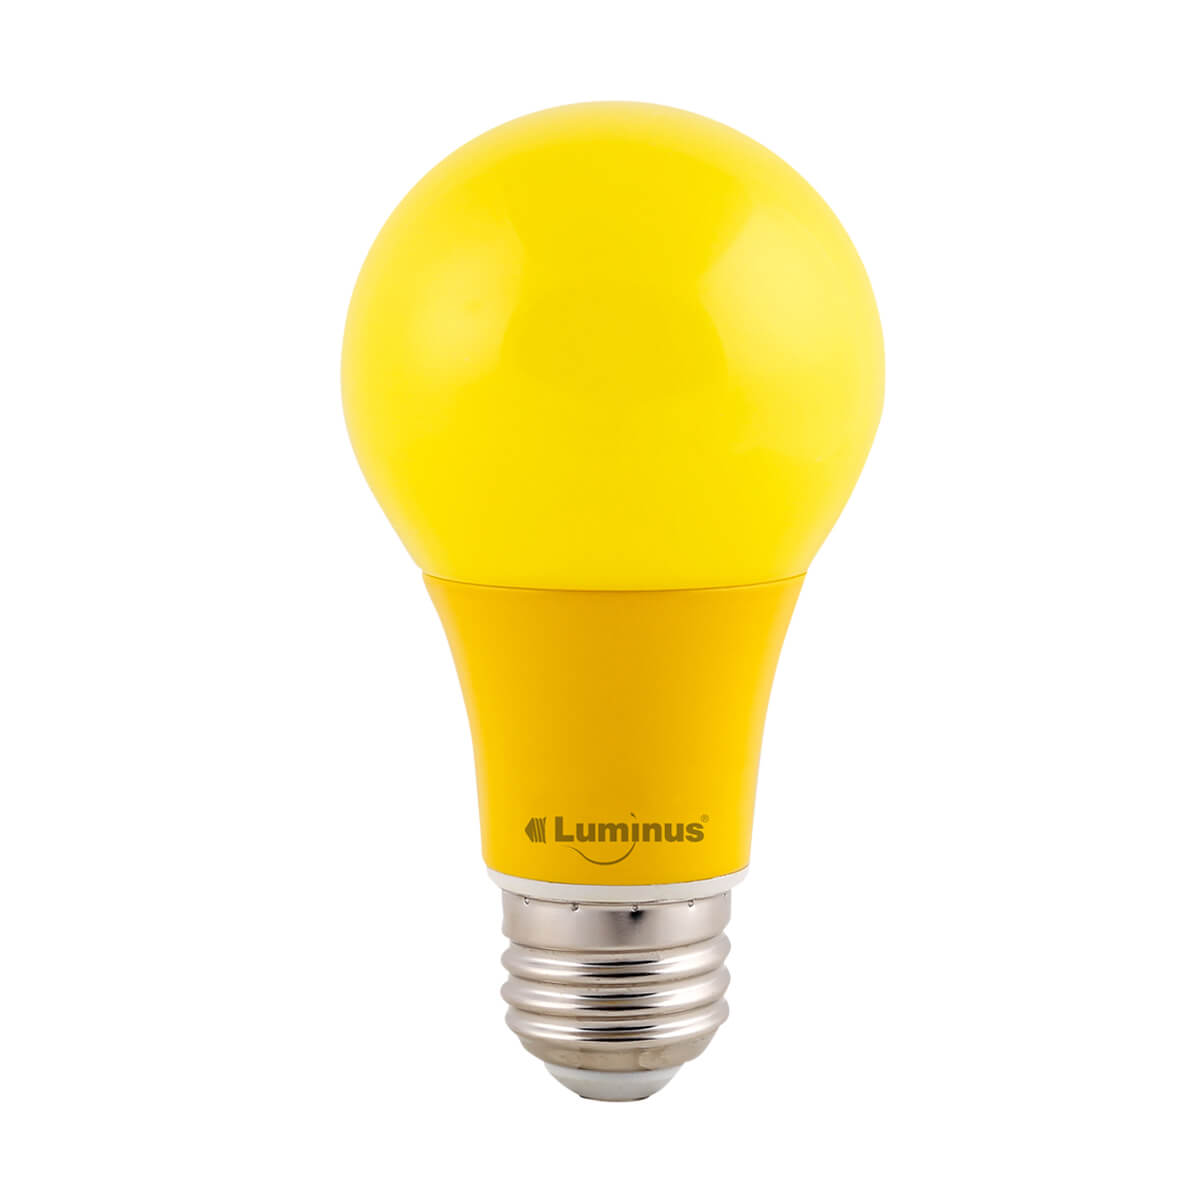 Luminus LED A19 Bug Light